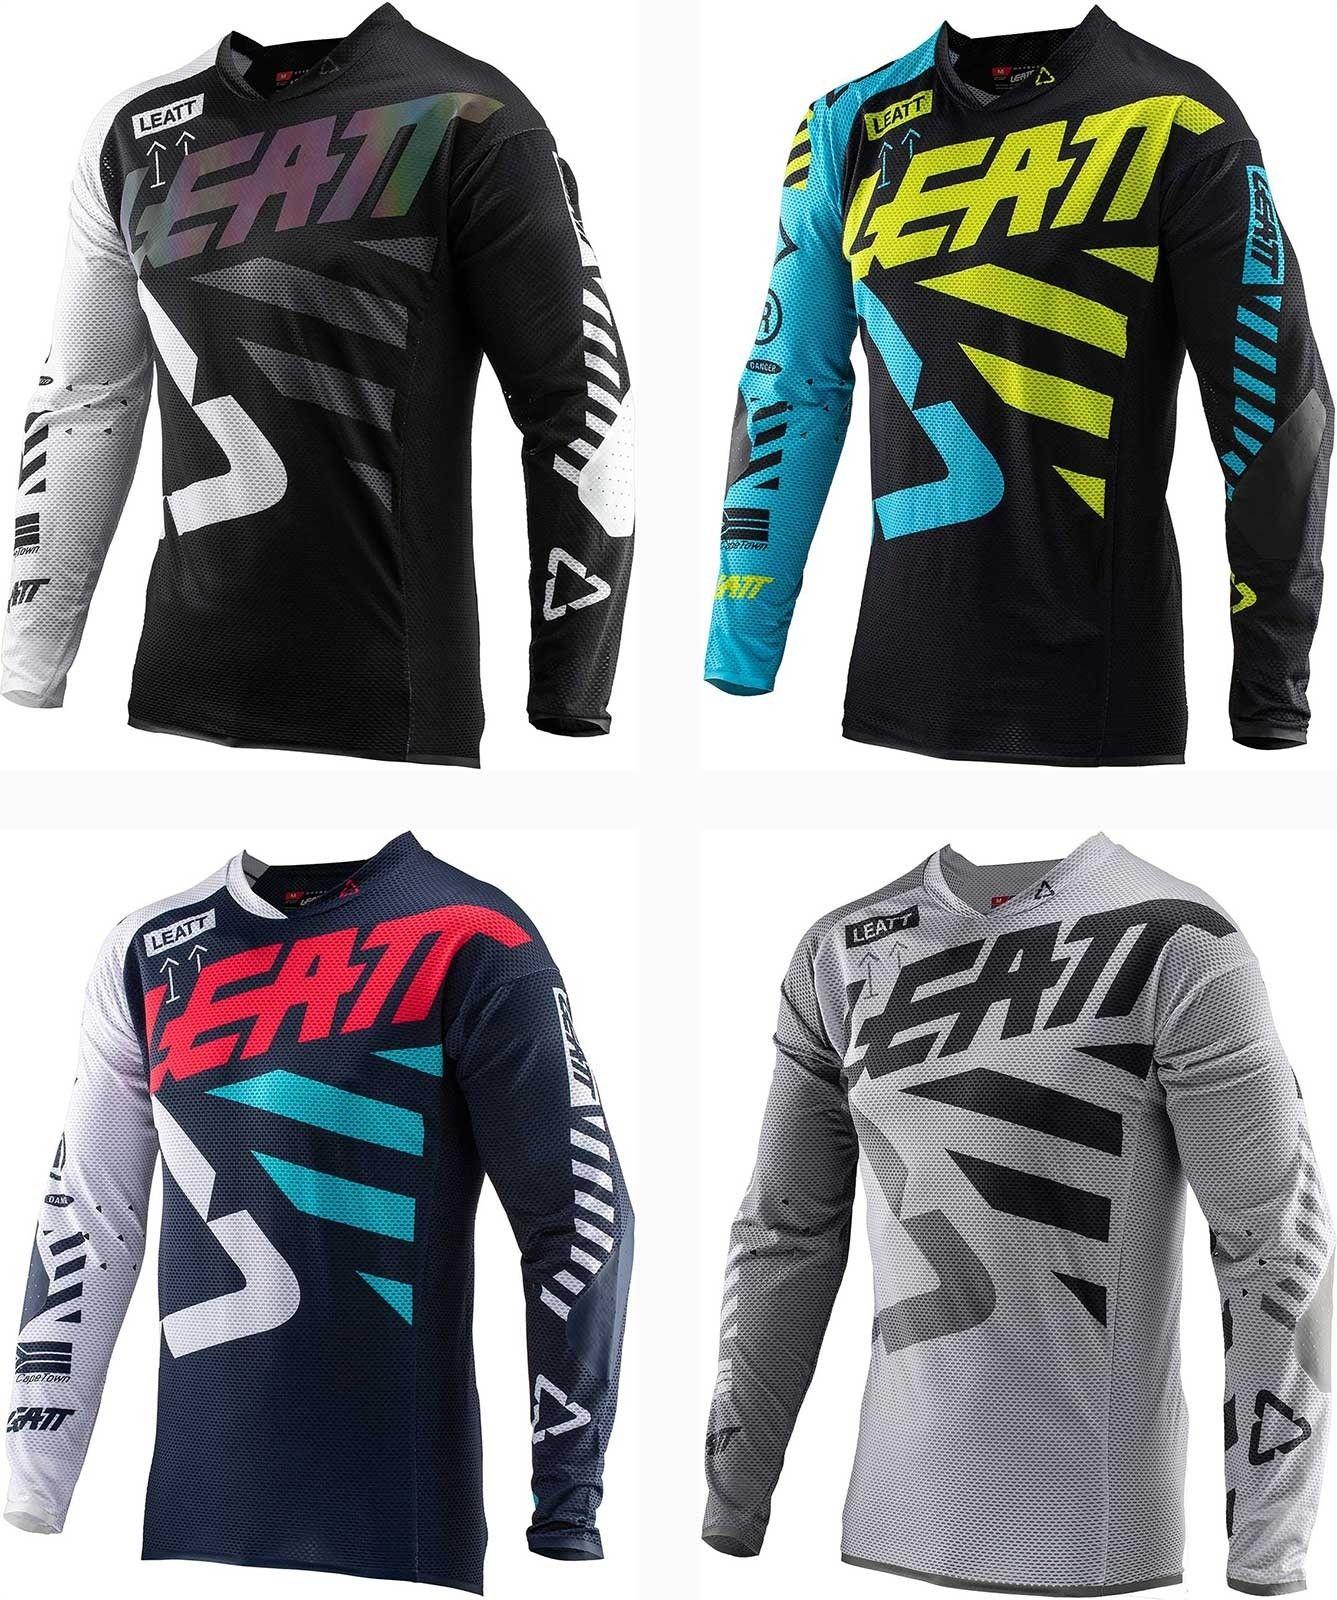 LEATT Racing MAVIC Downhill Jersey Mountainbike Motorrad Radfahren Jersey Crossmax Hemd Ciclismo Kleidung für Männer MTB T Hemd